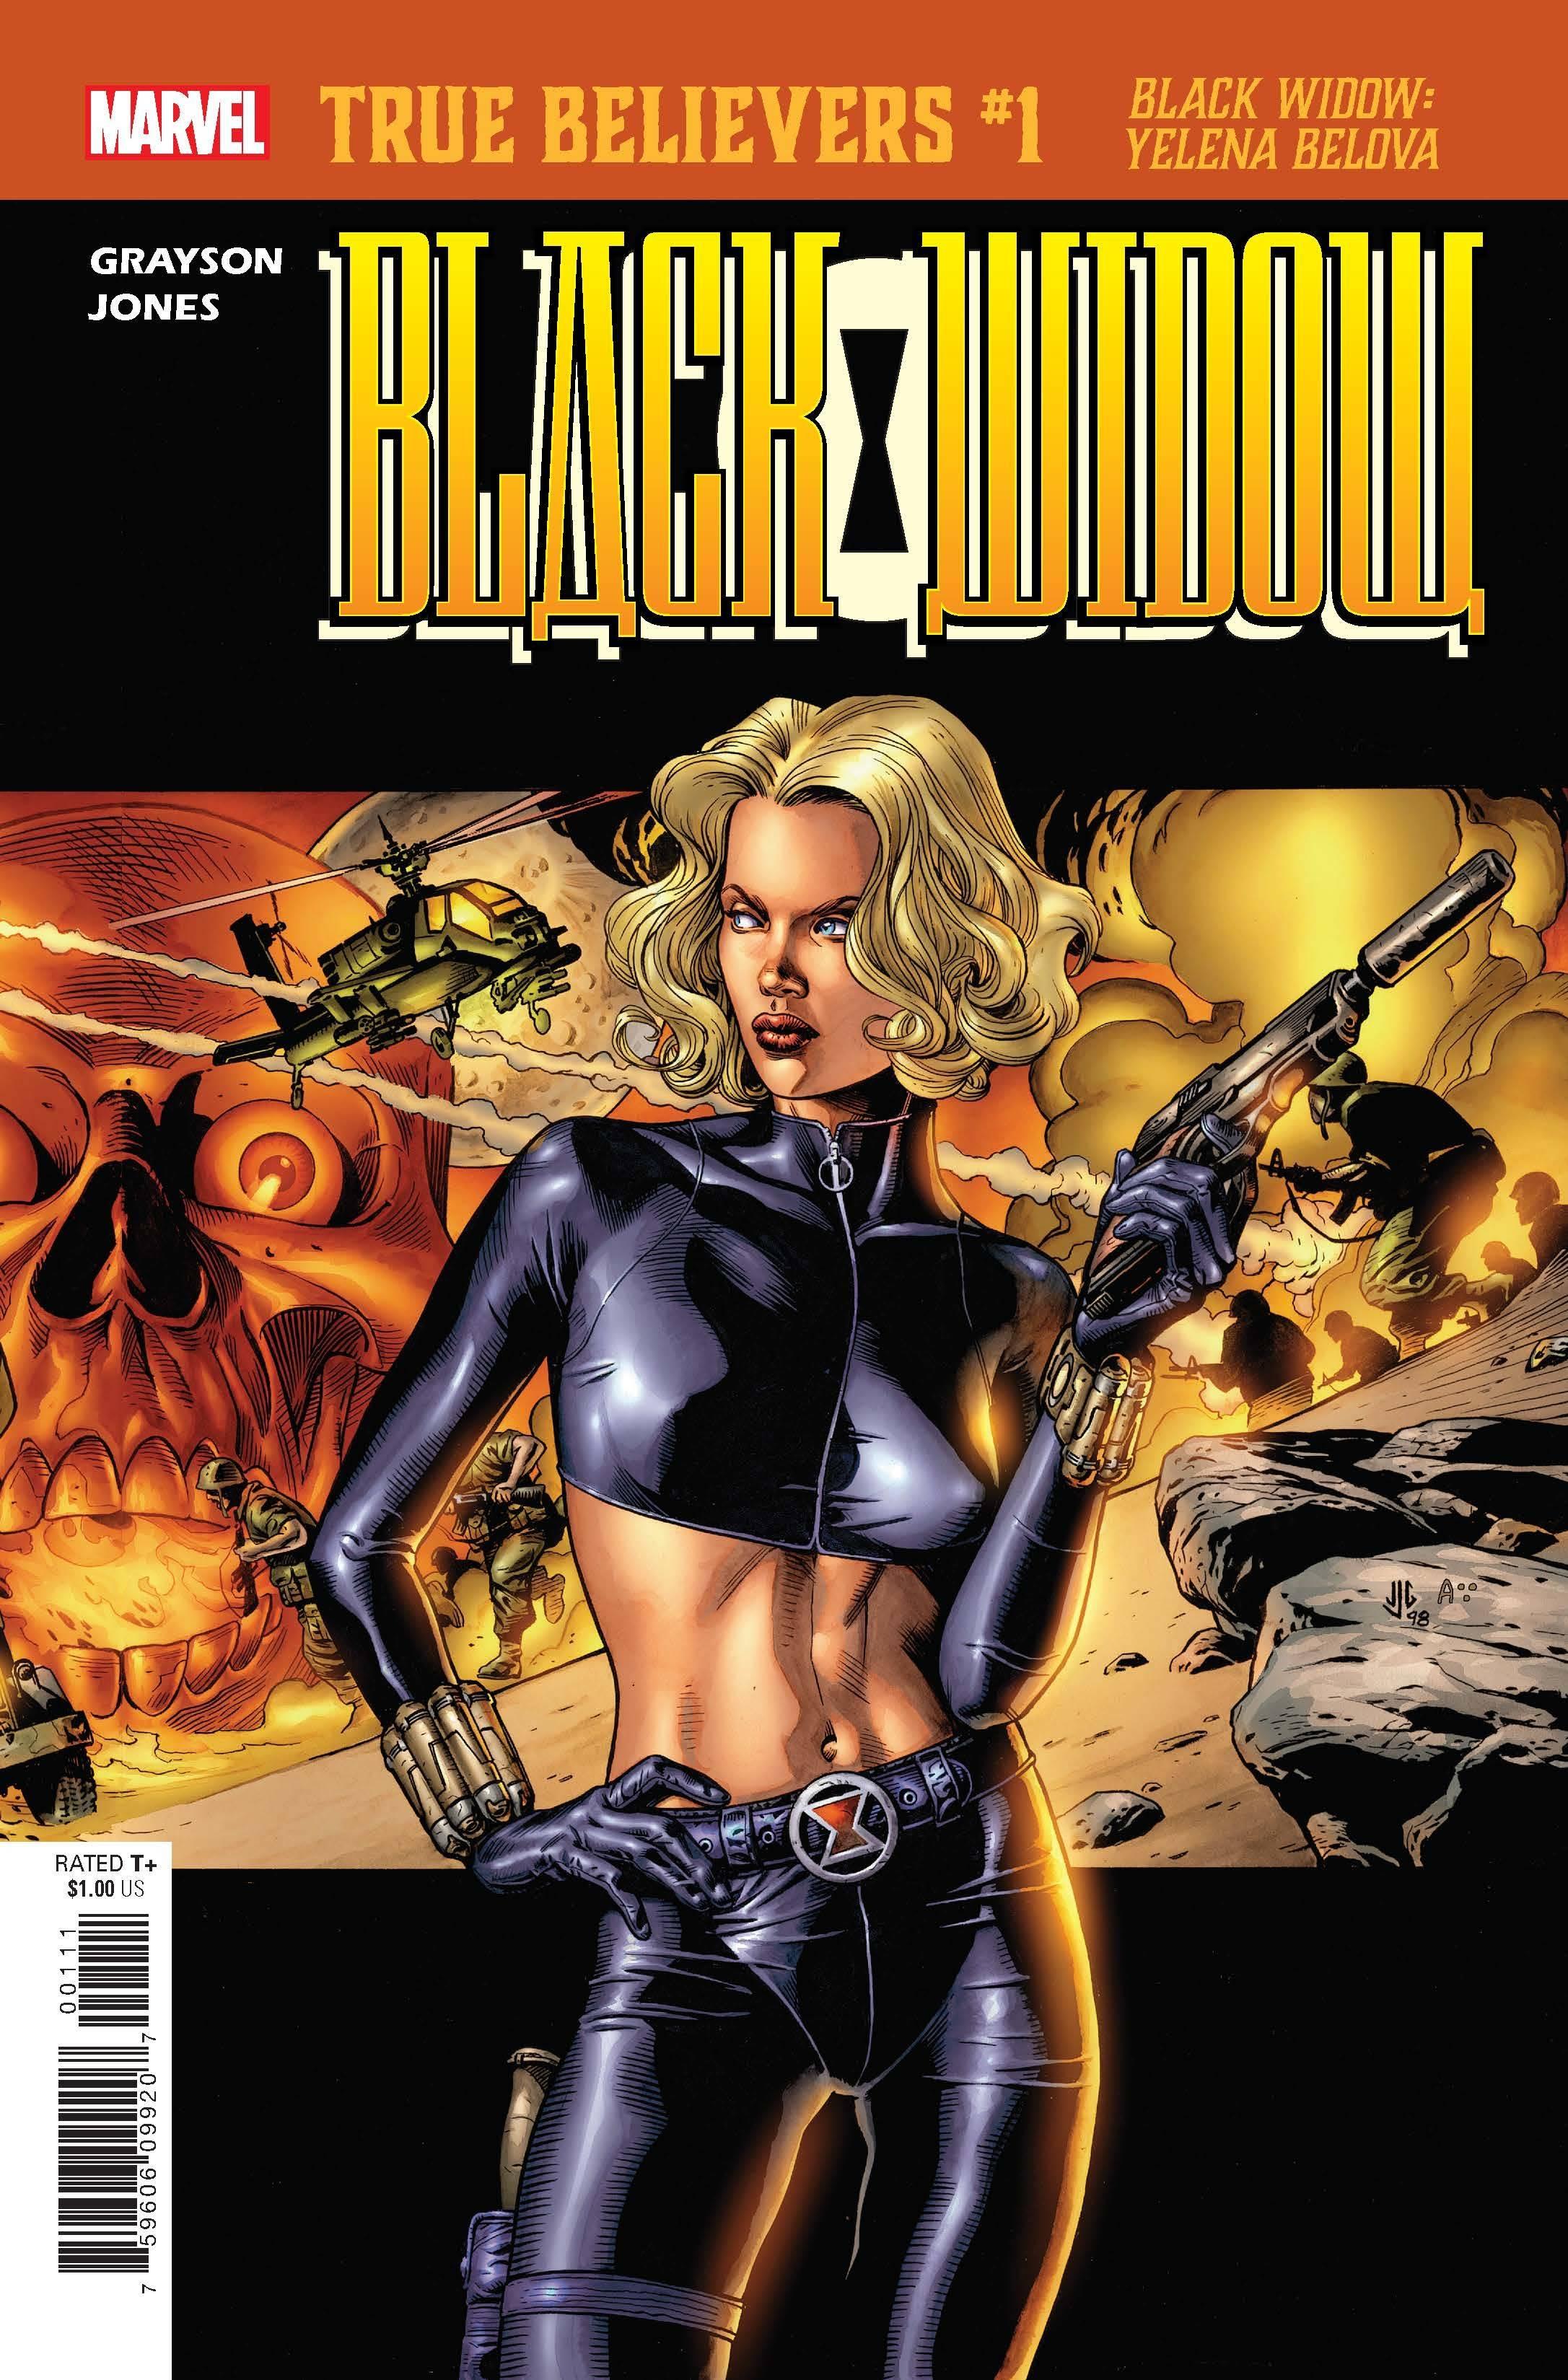 True Believers: Black Widow - Yelena Belova #1